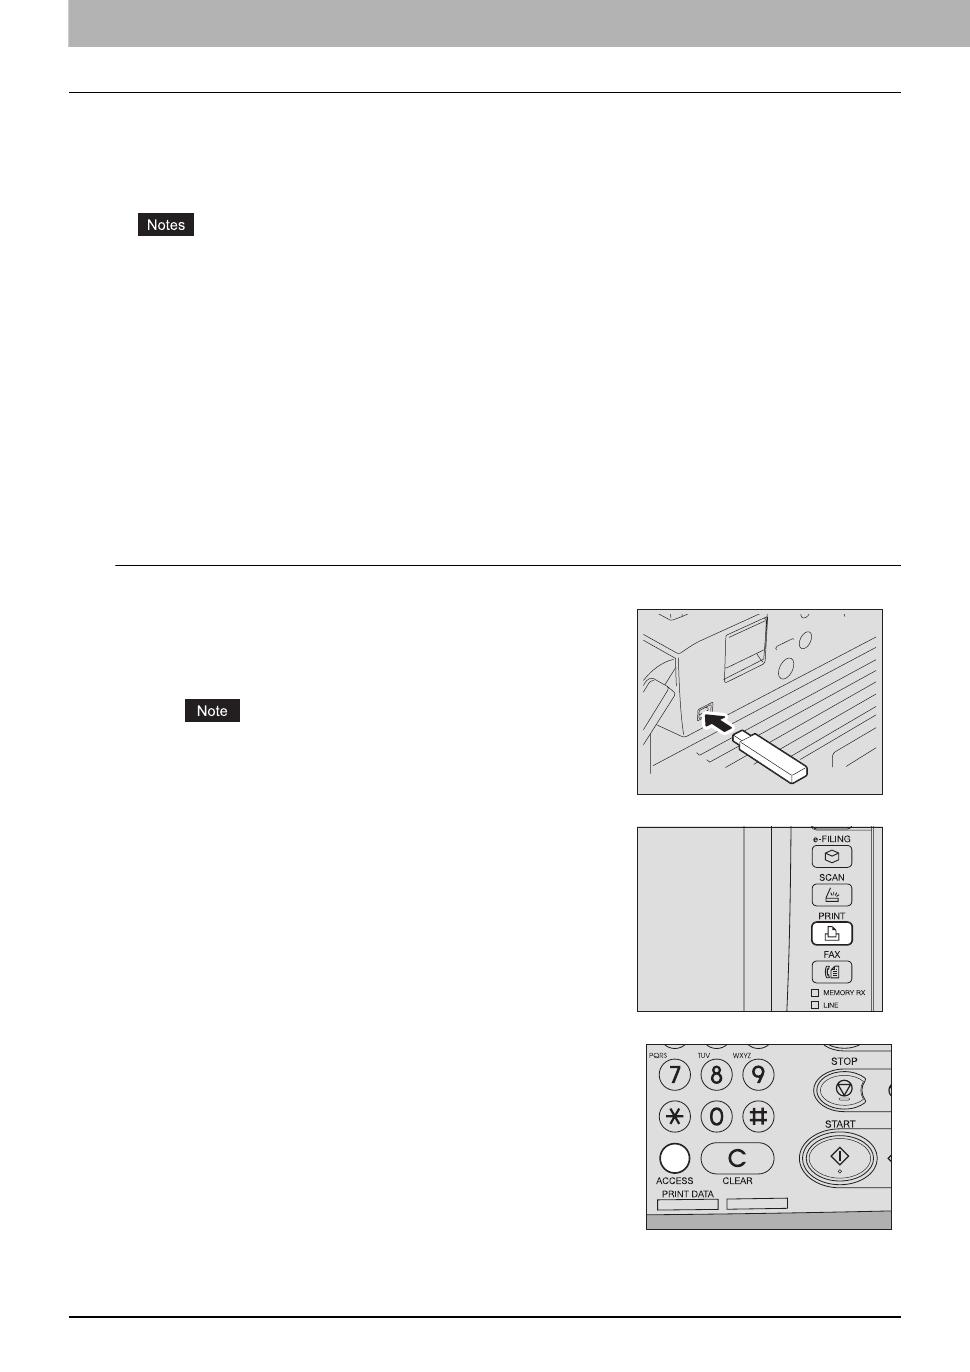 Toshiba 4520c user manual.